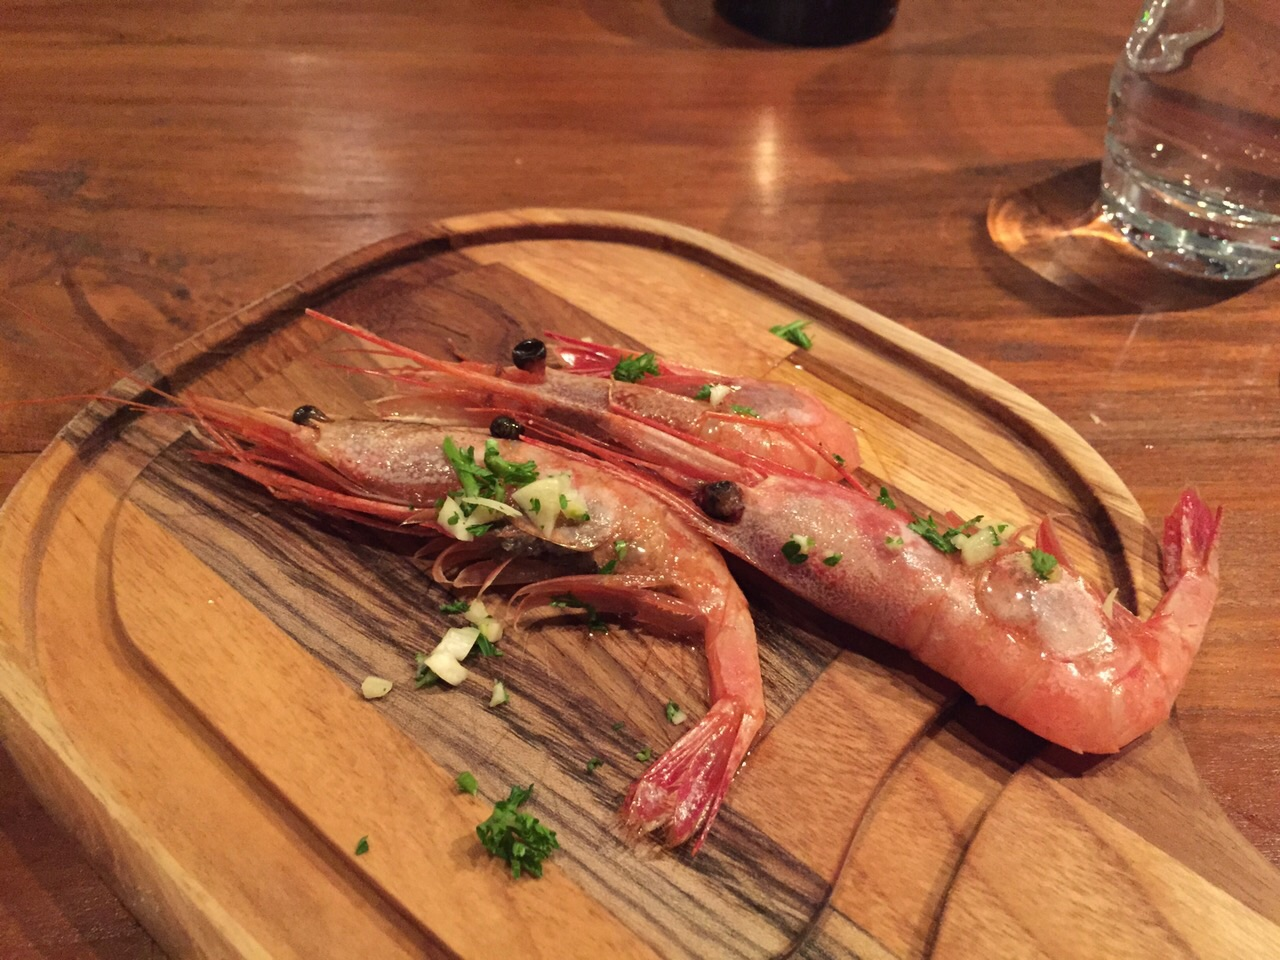 Javanegra tapas in the heart of jakarta tastetalks for Triple tail fish taste